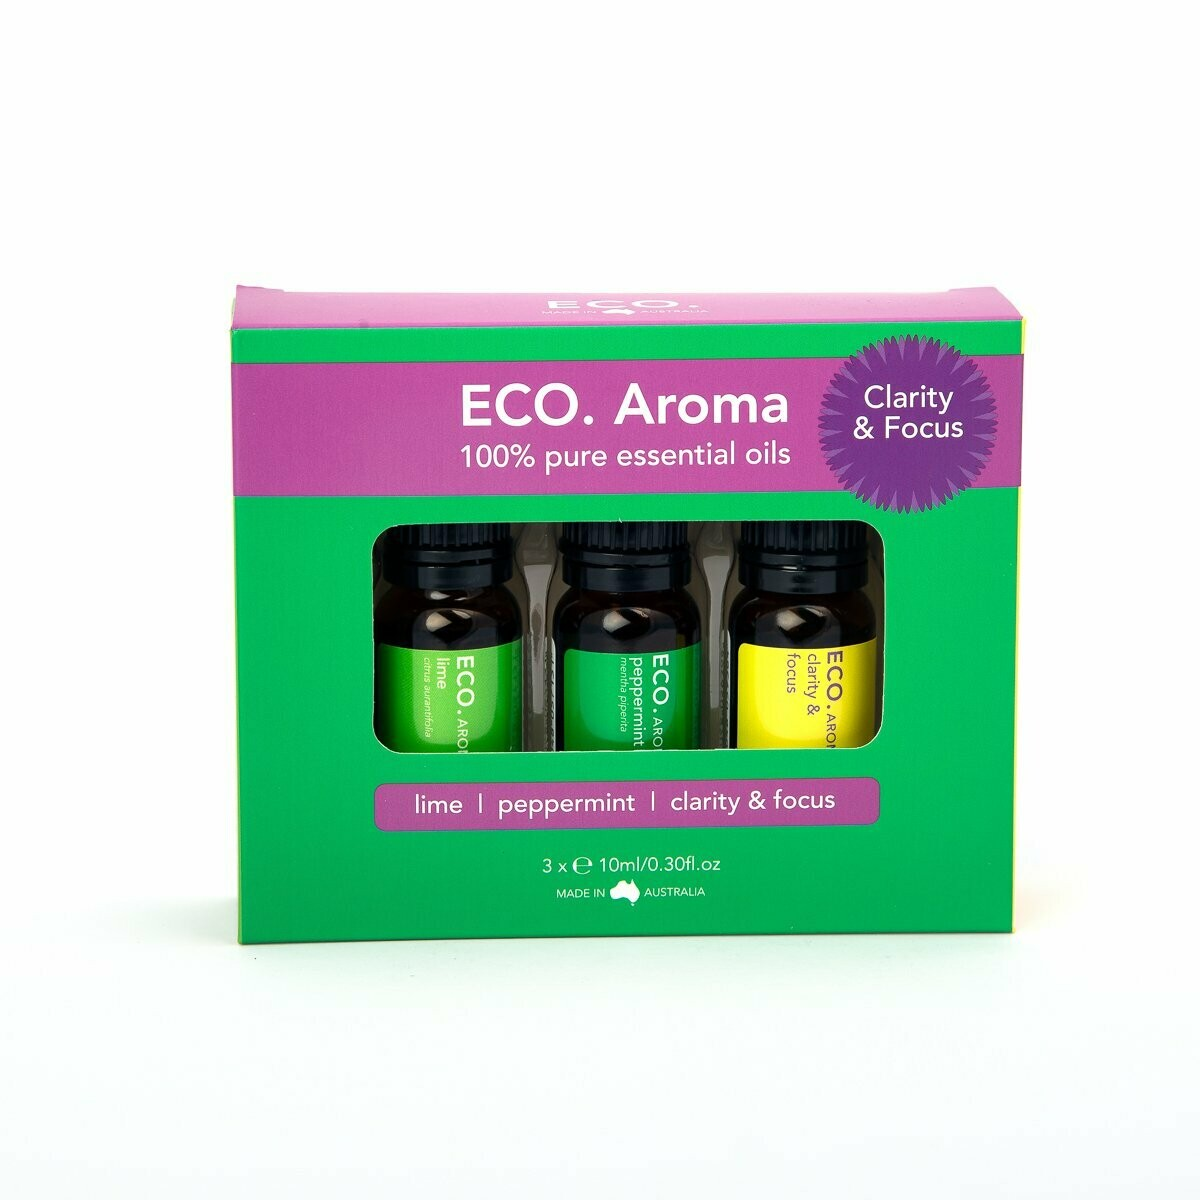 ECO. Clarity & Focus Aroma Trio (Lime, Peppermint, Clarity & Focus Blend)